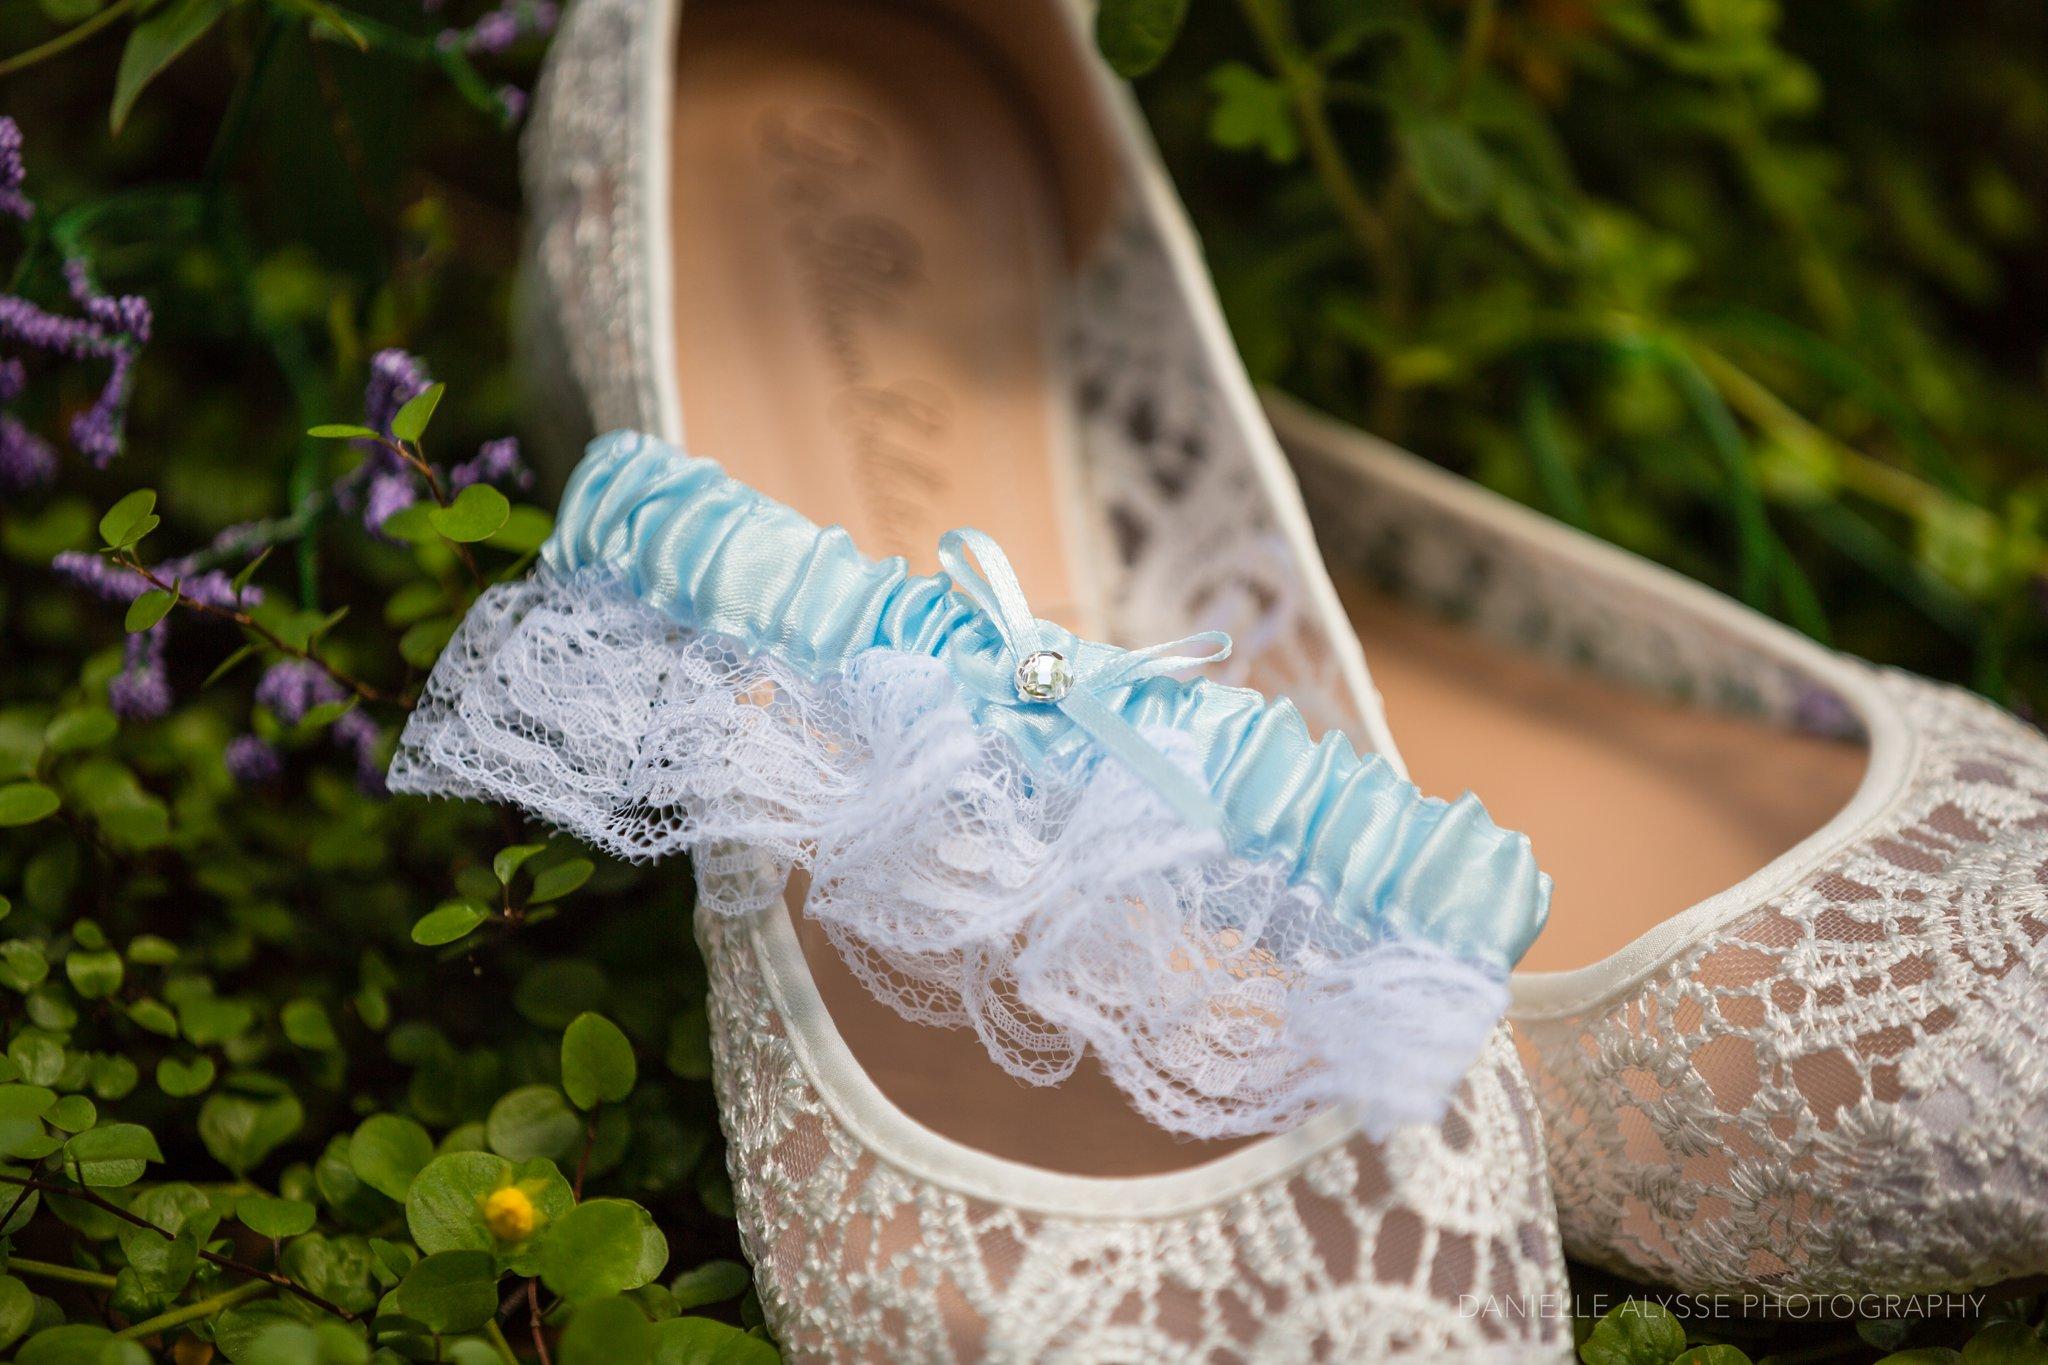 170507_blog_megan_david_wedding_loomis_flower_farm_inn_danielle_alysse_photography_sacramento_photographer0008_WEB.jpg